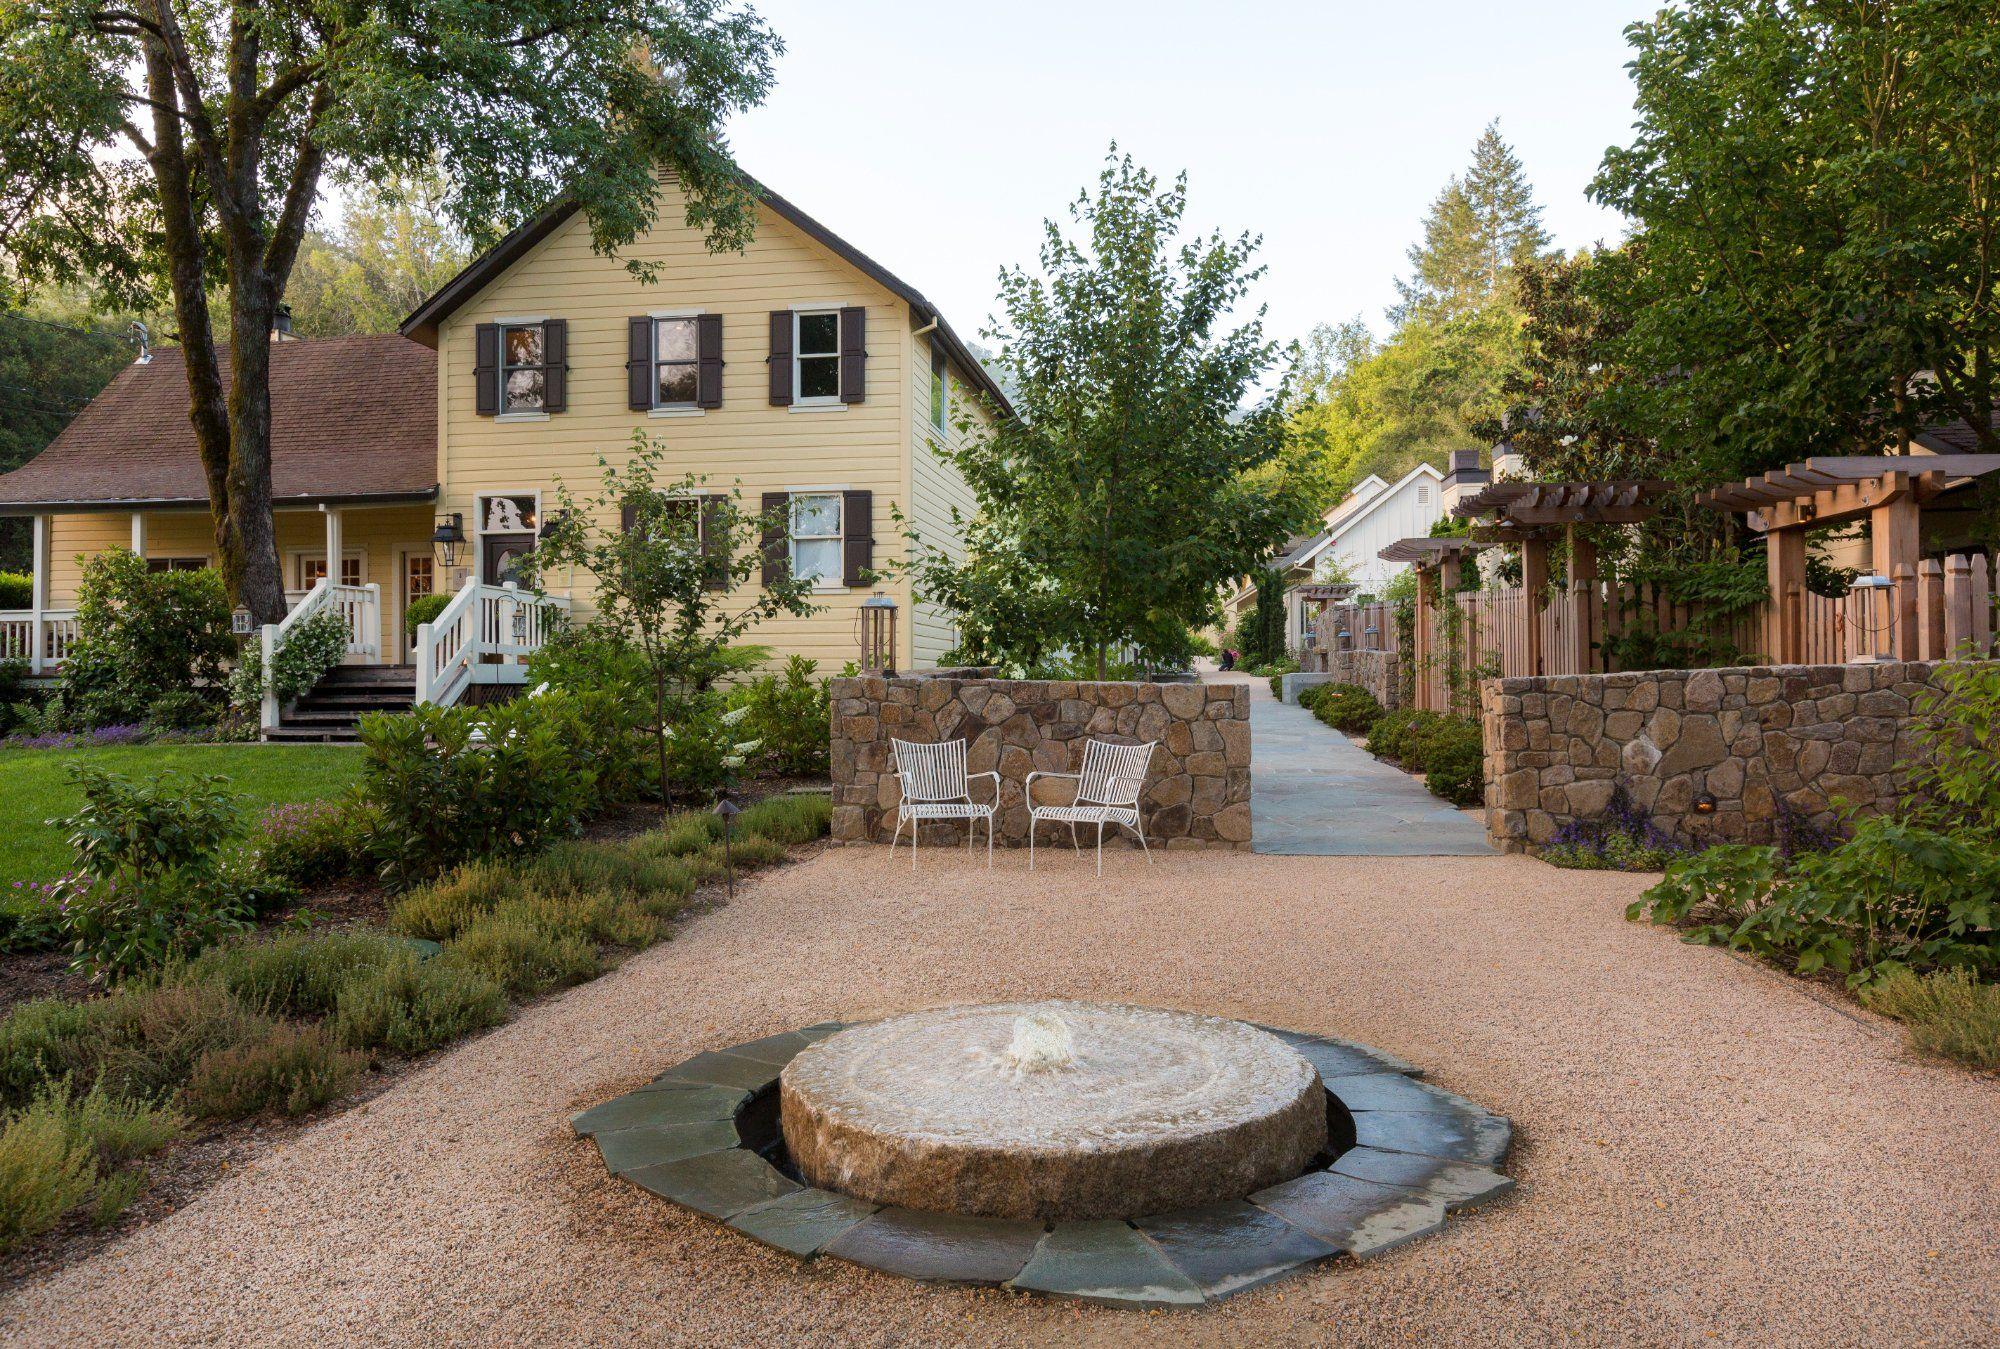 Farmhouse Inn Updated 2017 Prices Hotel Reviews Forestville Ca Sonoma County Tripadvisor